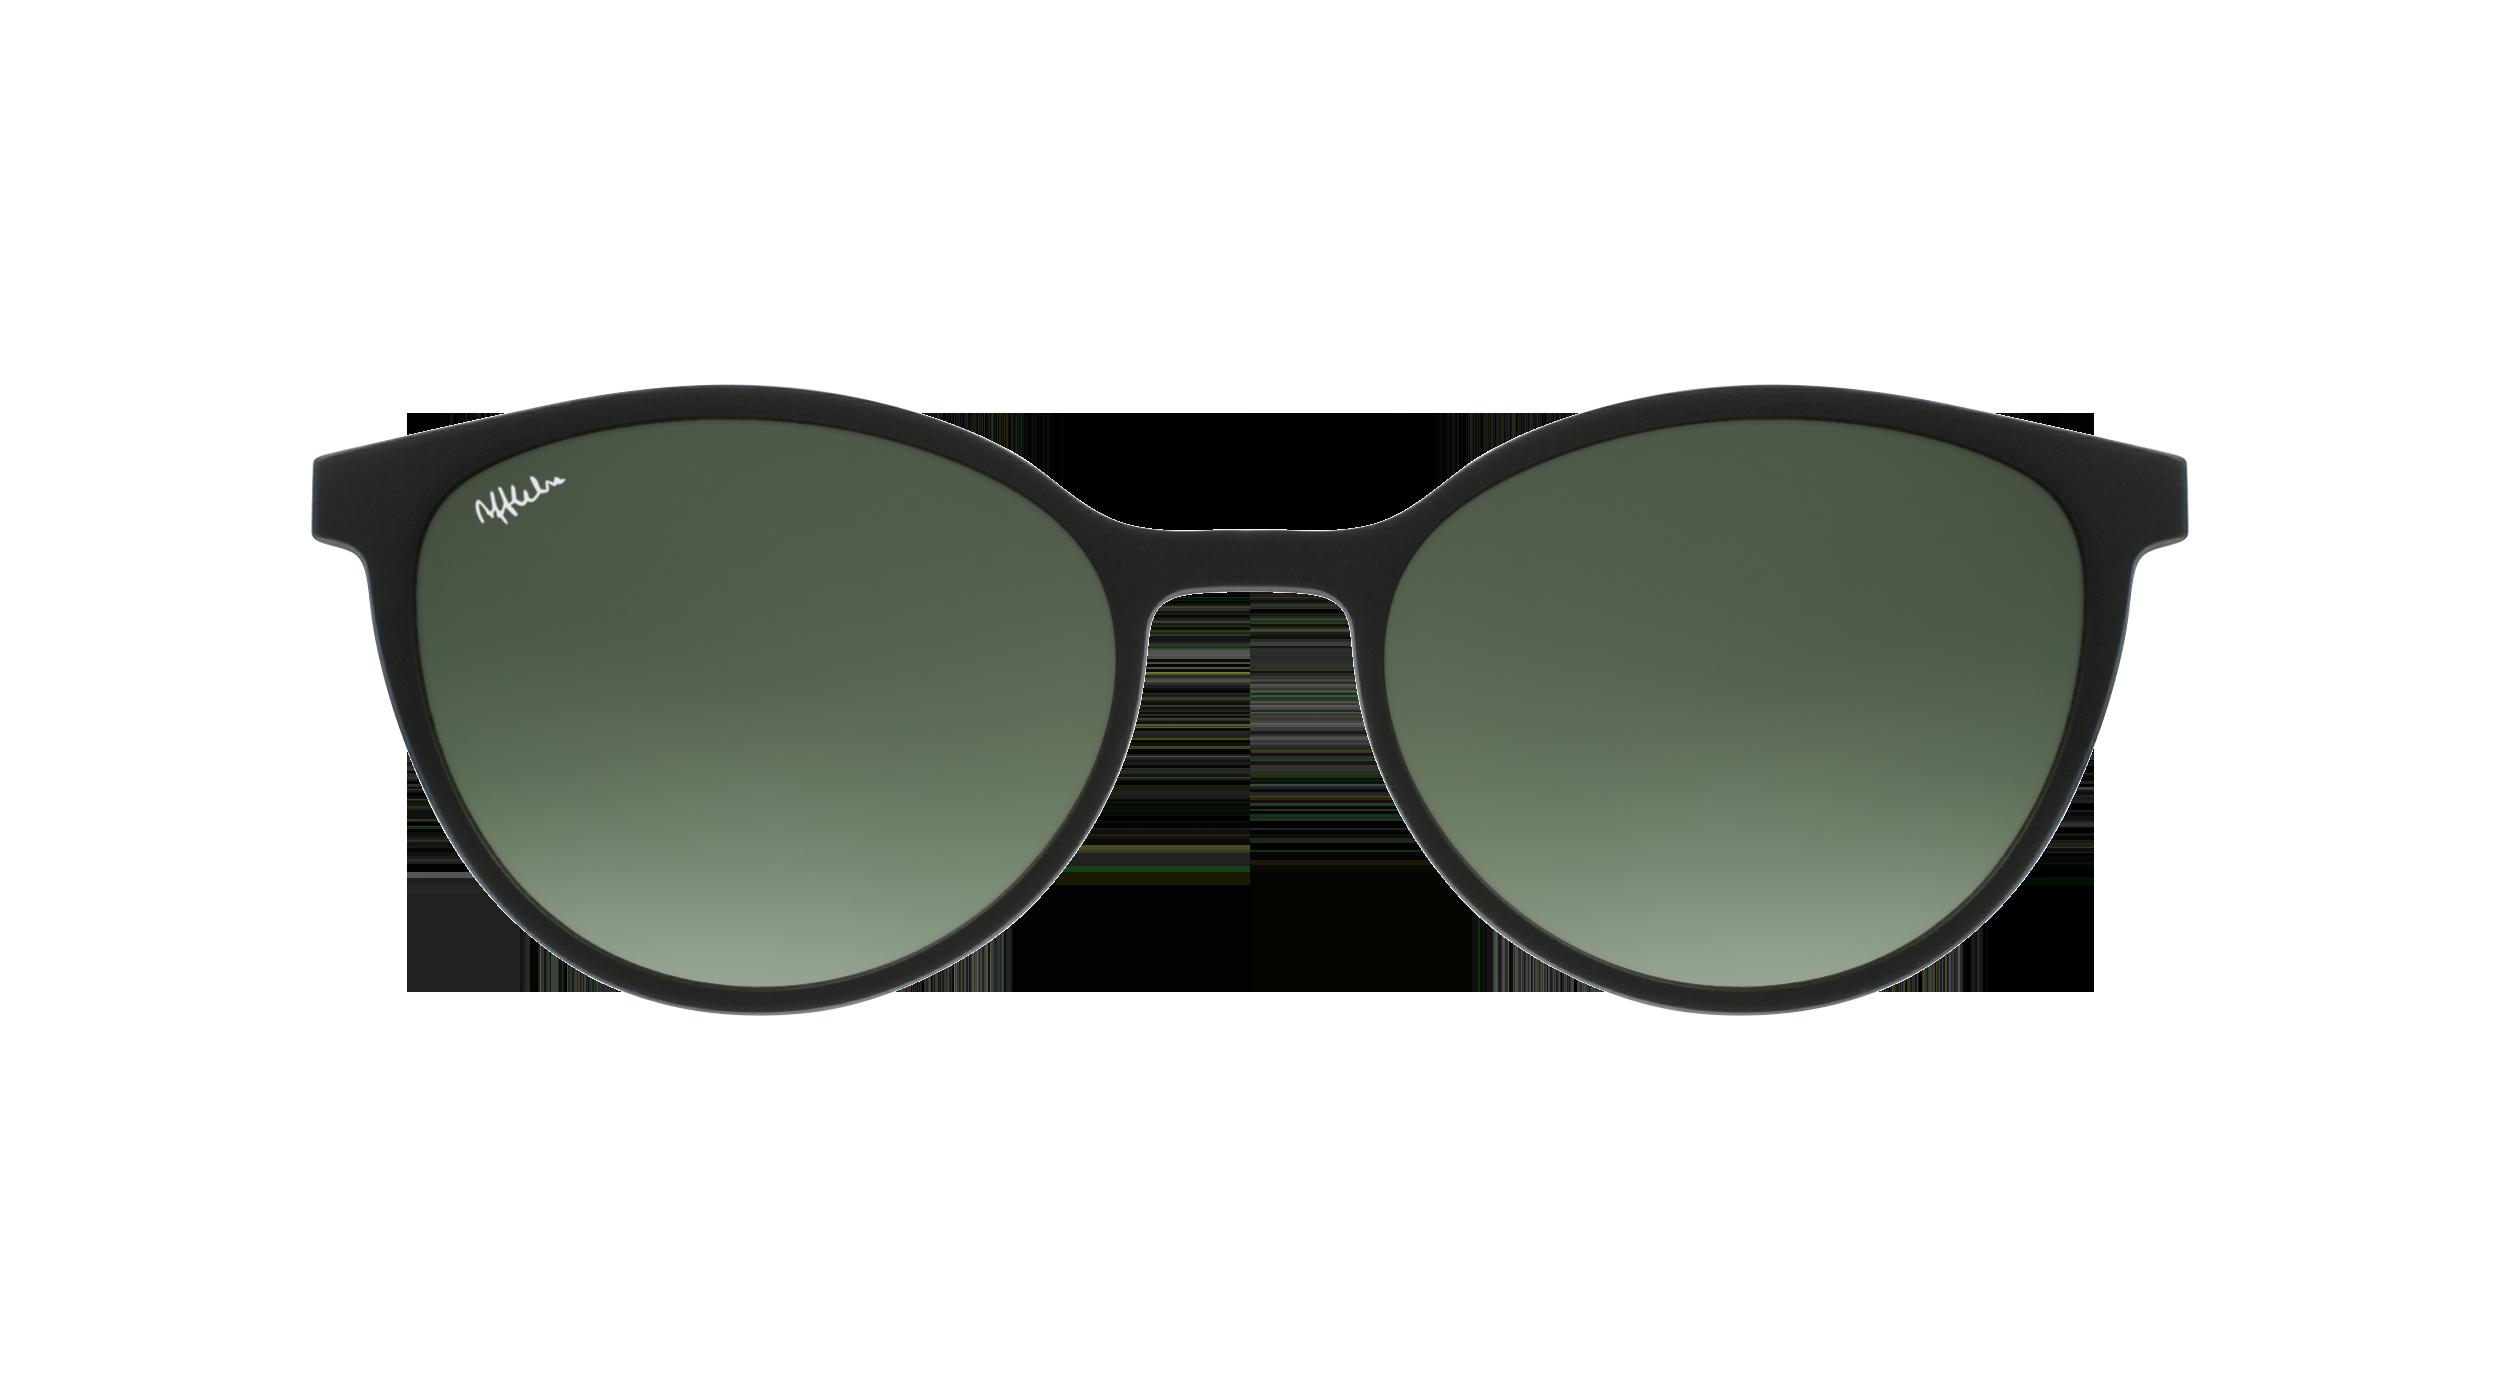 afflelou/france/products/smart_clip/clips_glasses/07630036458969.png